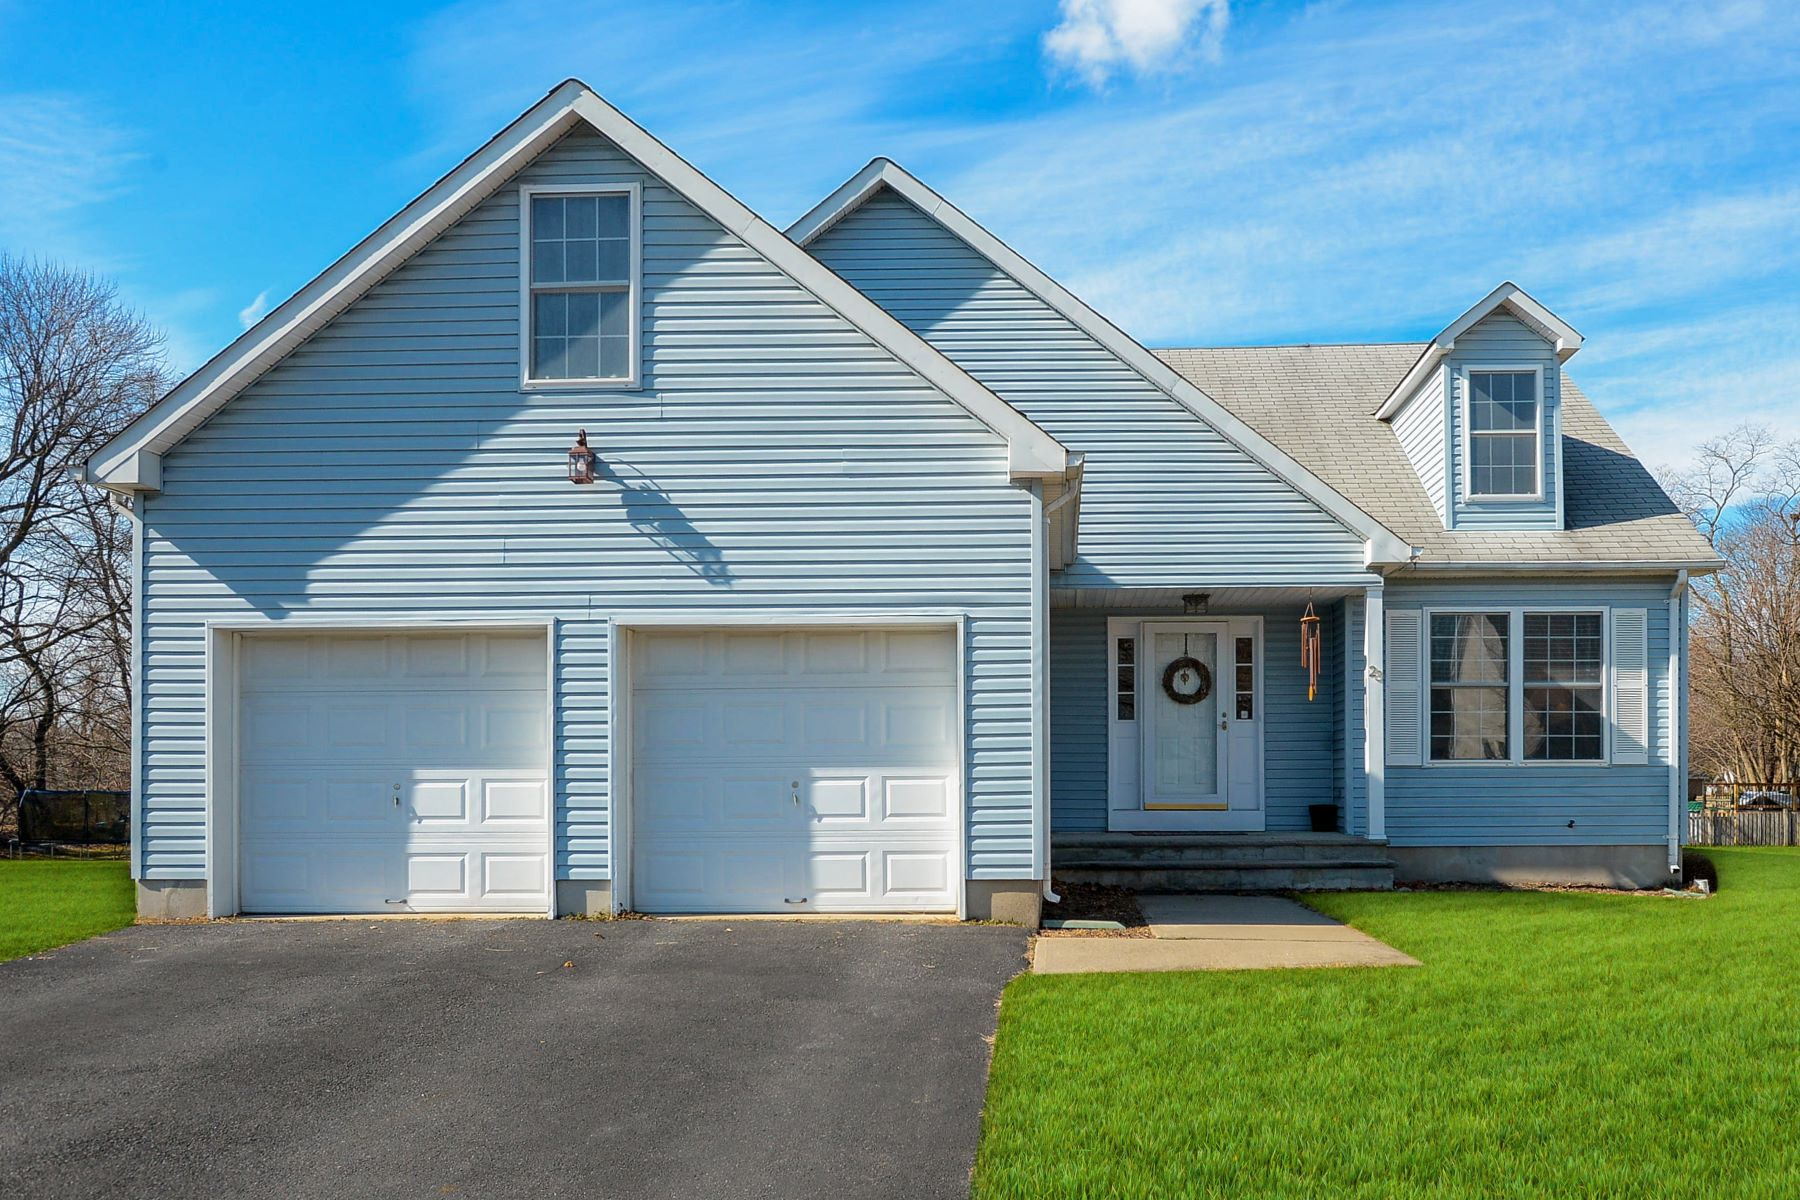 Single Family Homes для того Продажа на Desirable Colonial 23 Frelinghuysen Street, Belvidere, Нью-Джерси 07823 Соединенные Штаты